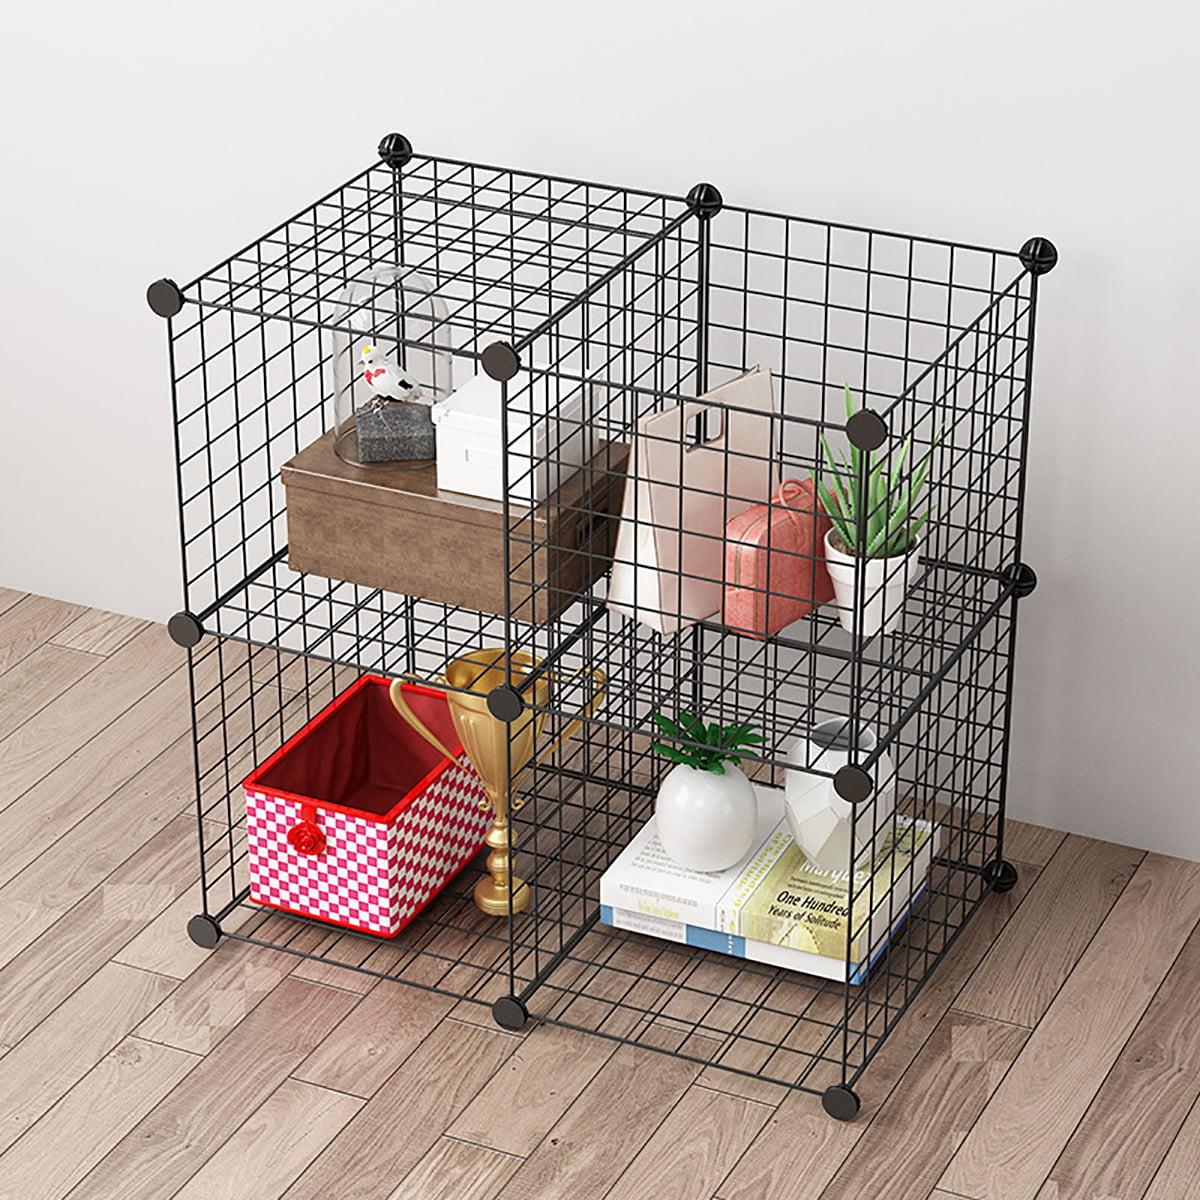 Metal Wire Cube Storage 4 12 Cube Shelves Organizer Stackable Storage Bins Modular Bookcase Diy Closet Cabinet Shelf For Home Office Black Walmart Com Walmart Com